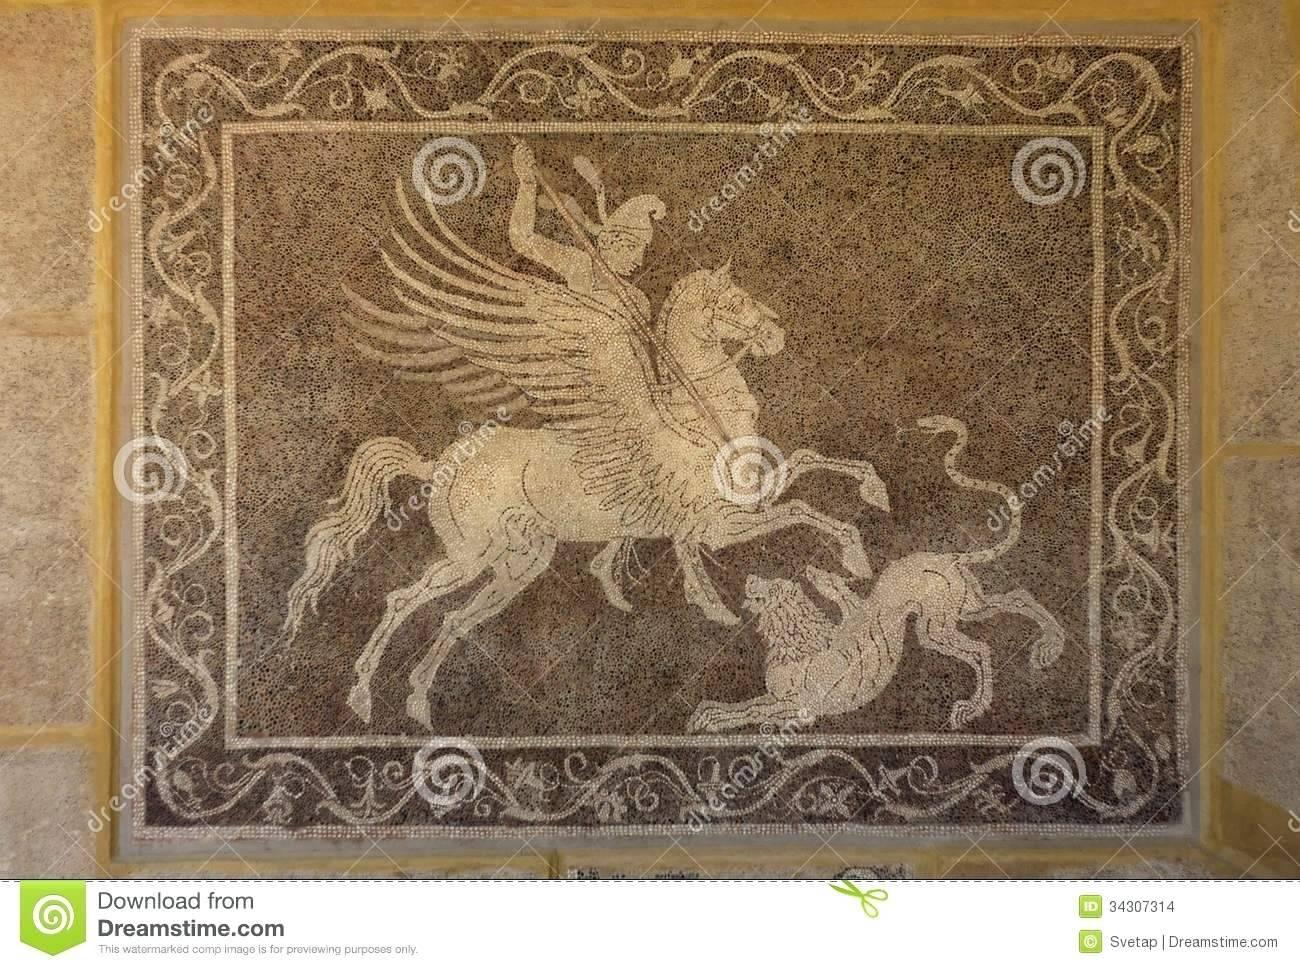 Articles With Greek Ceramic Wall Art Label: Terrific Greek Wall Inside Most Current Greek Wall Art (View 7 of 20)